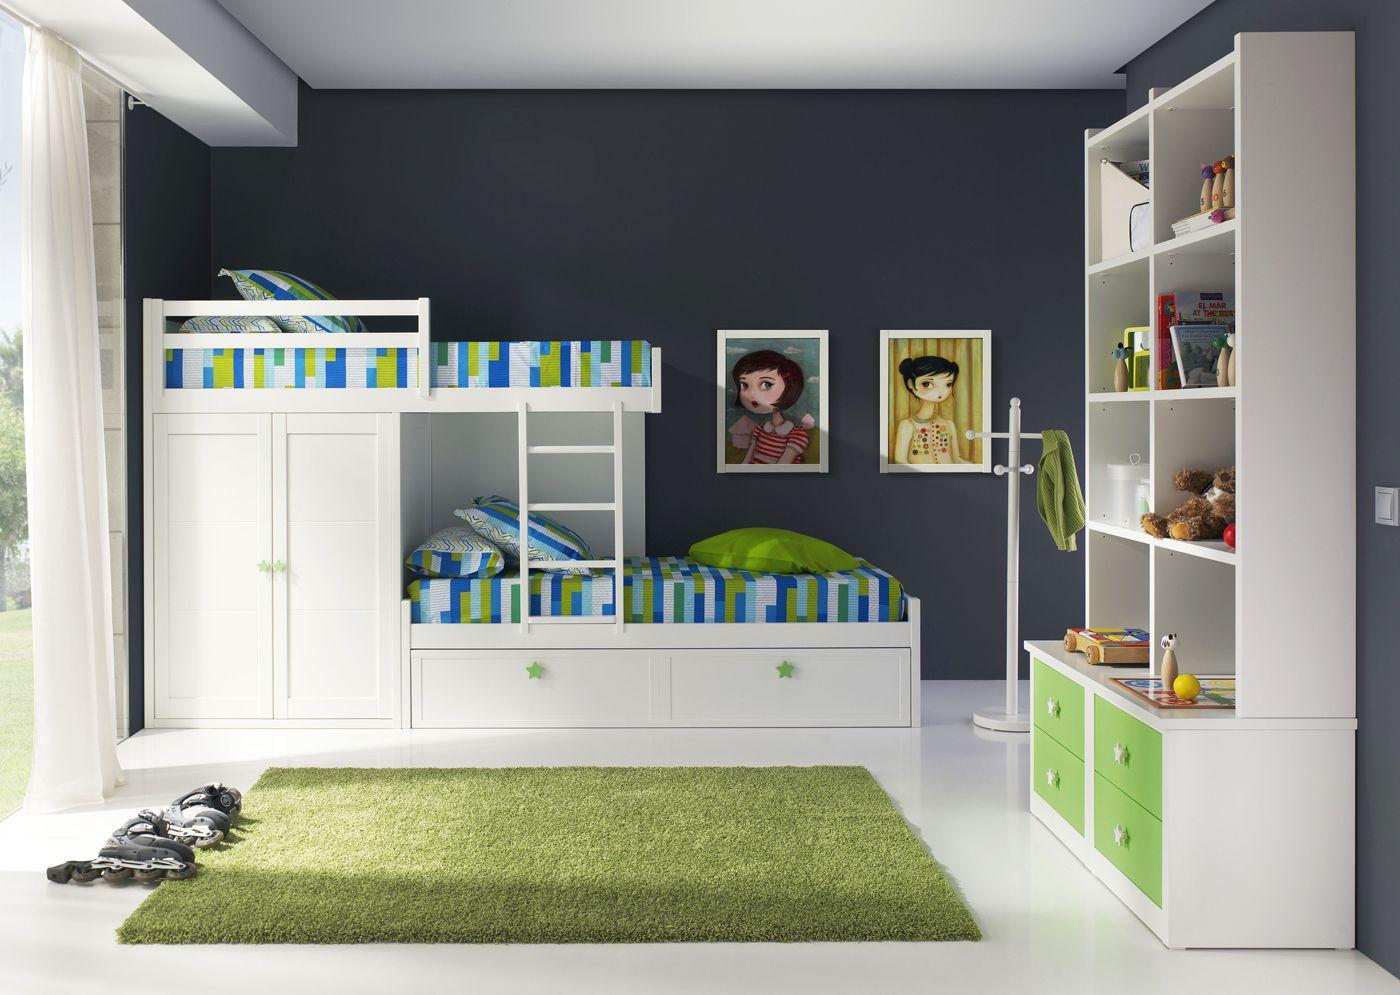 Dormitorio infantil con 3 camas litera tipo tren m s info for Dormitorios infantiles